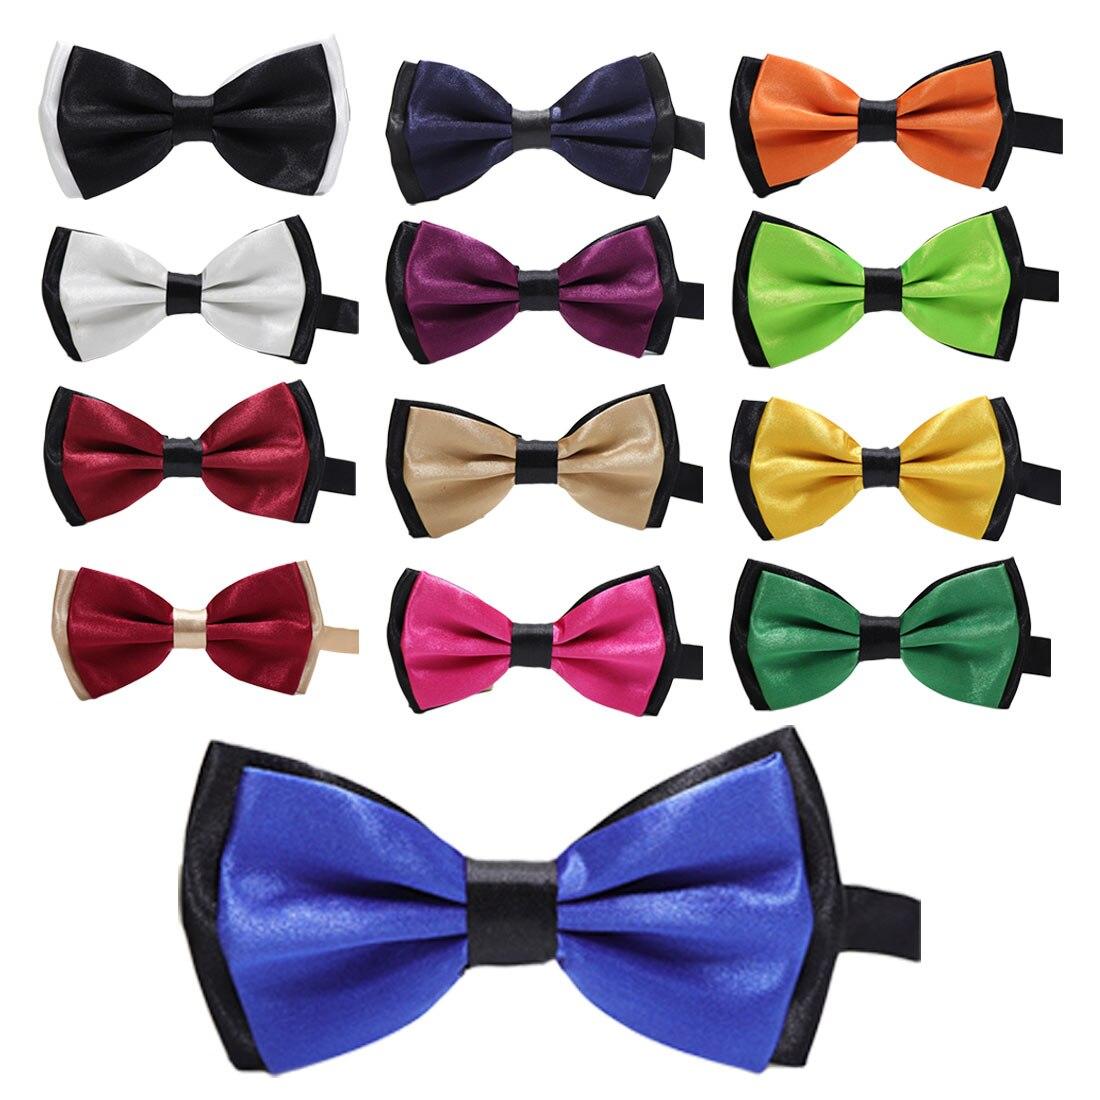 Boys Bow Tie Butterfly Polyester Baby Bow Tie Kids Neck Ties Necktie Wedding Bow Tie